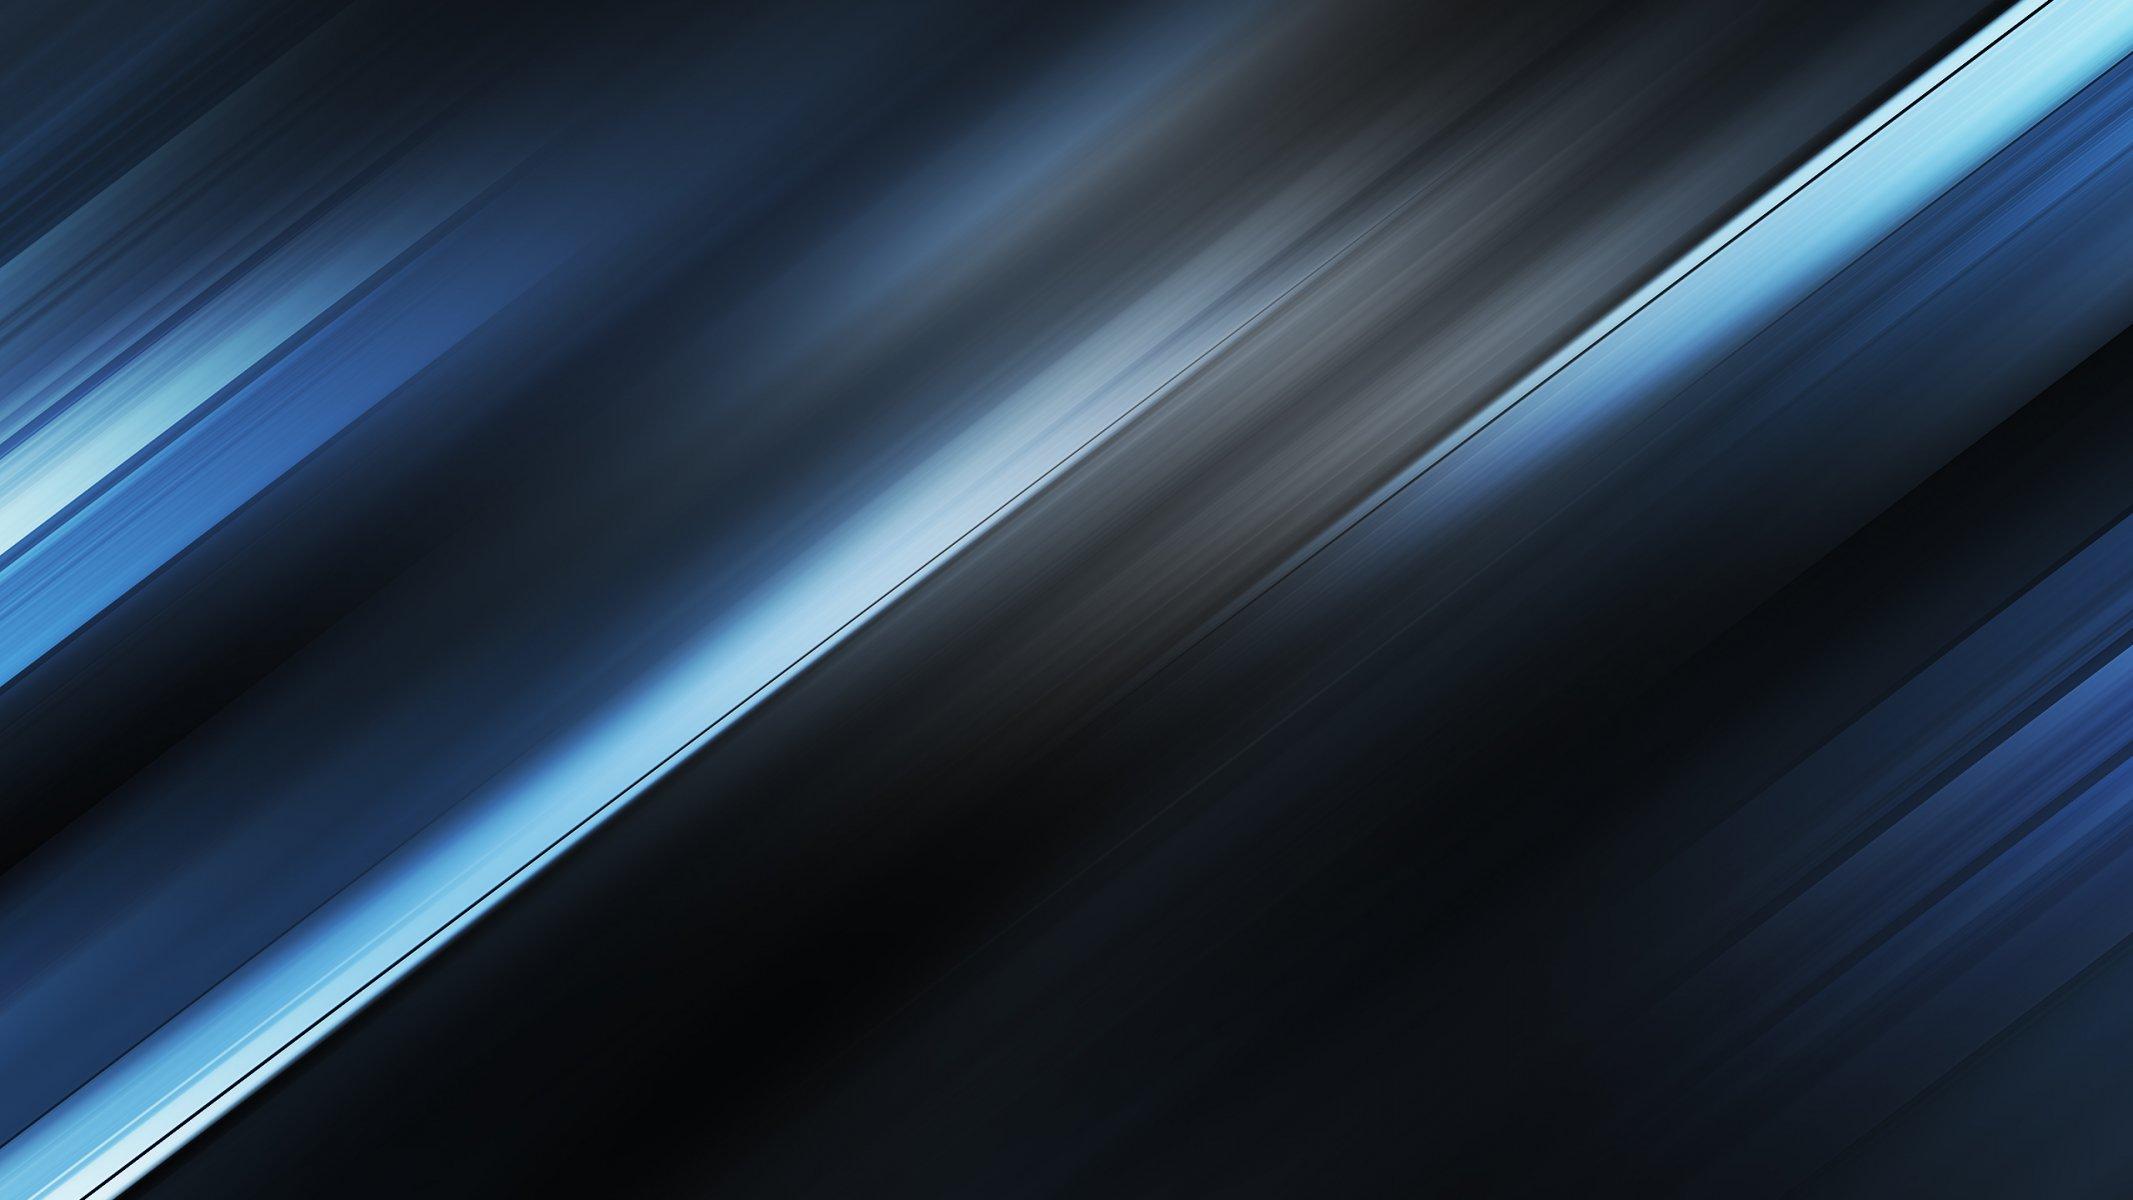 Обои серый, синие полоски. Автомобили foto 10